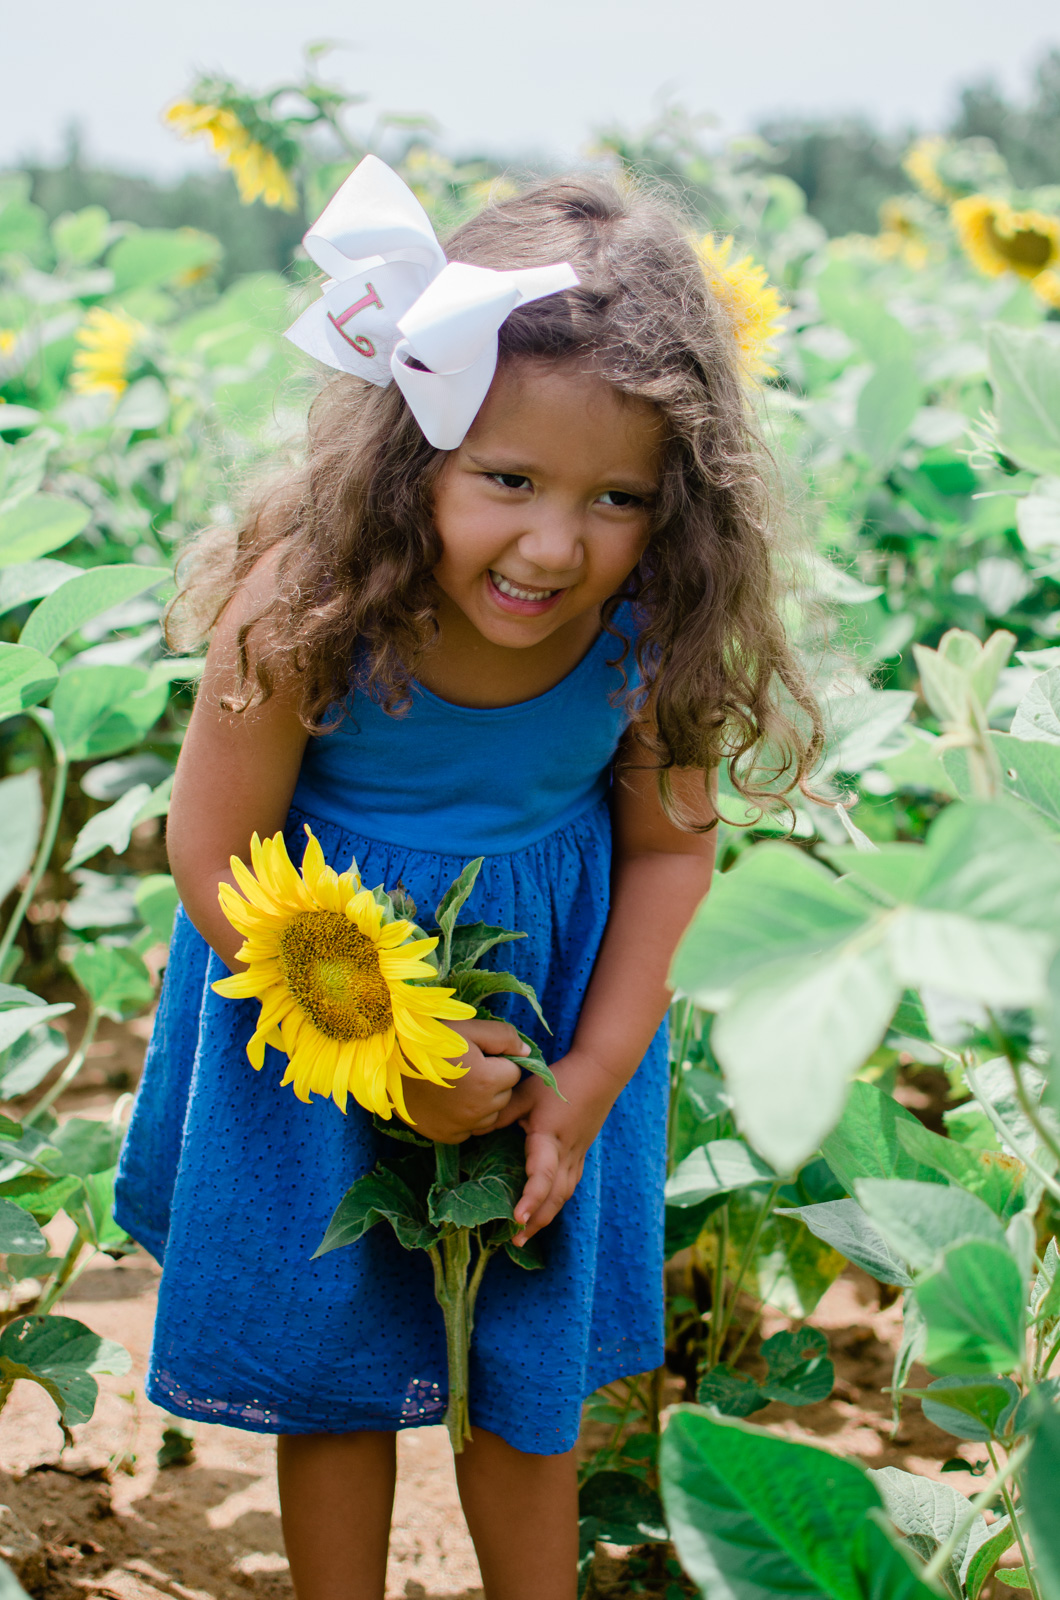 sunflower family photos - sunflower photo session | bylaurenm.com